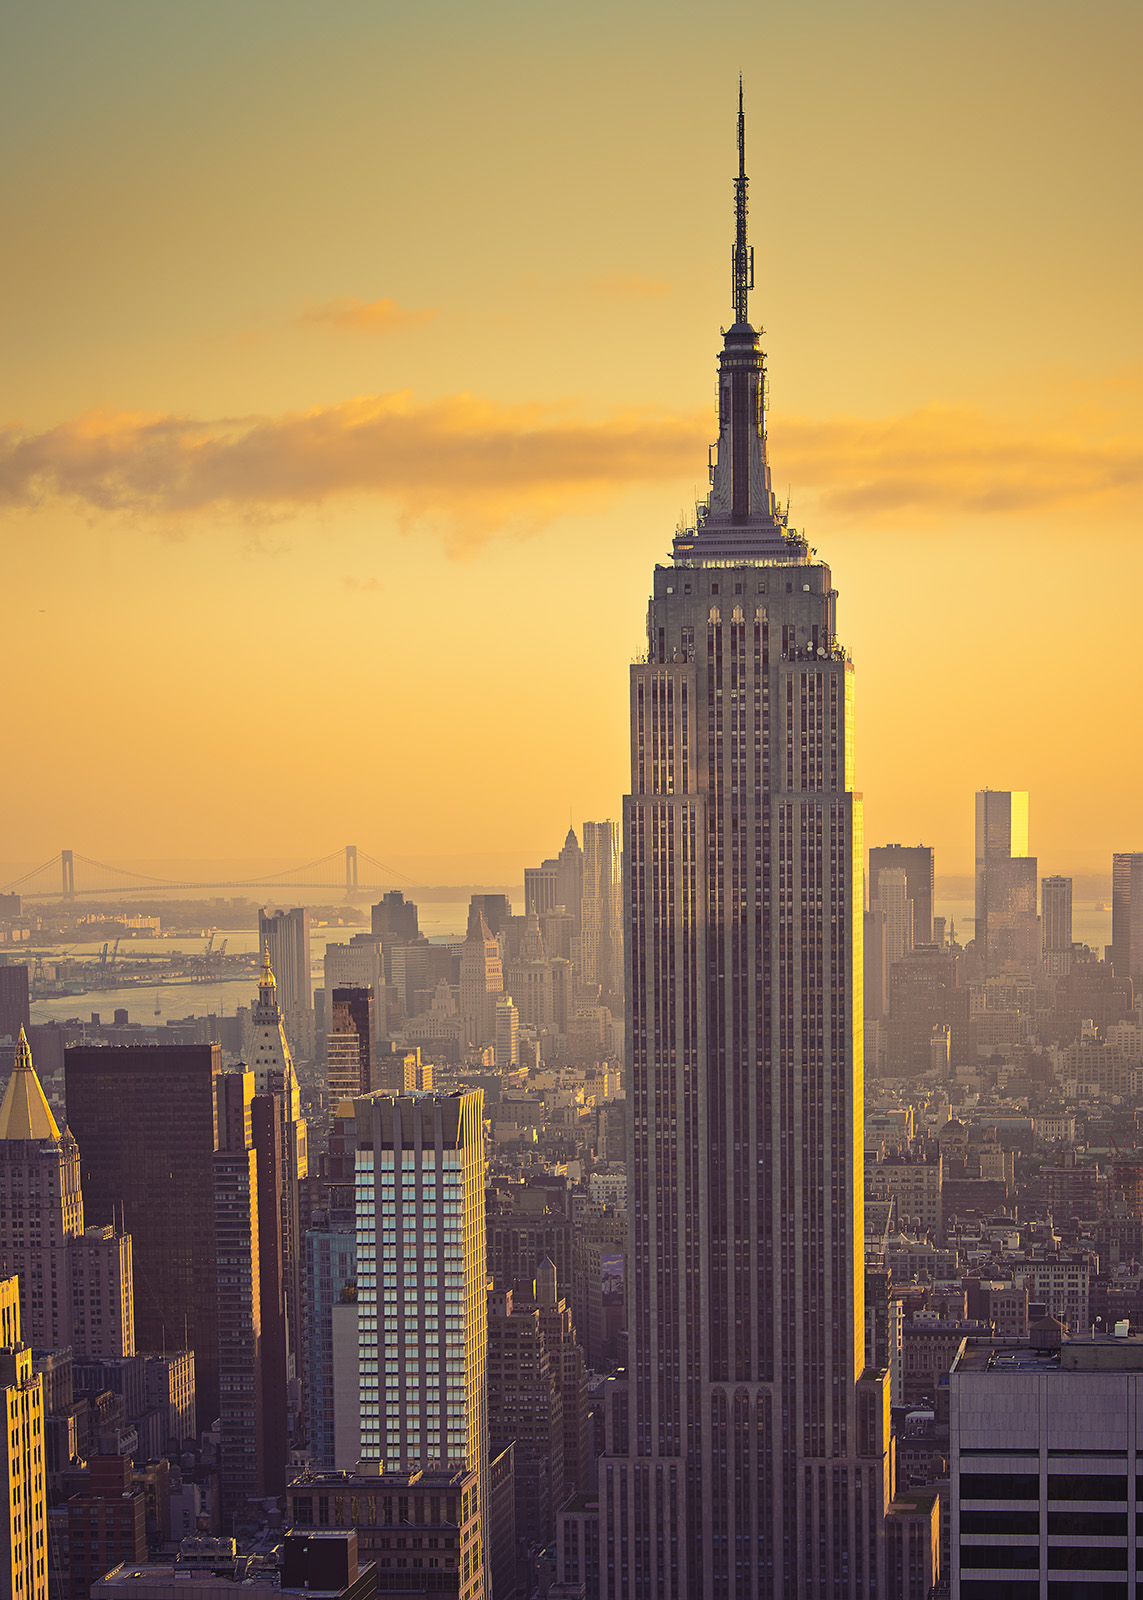 Empire State Building retro toner av Peder Aaserud Eikeland